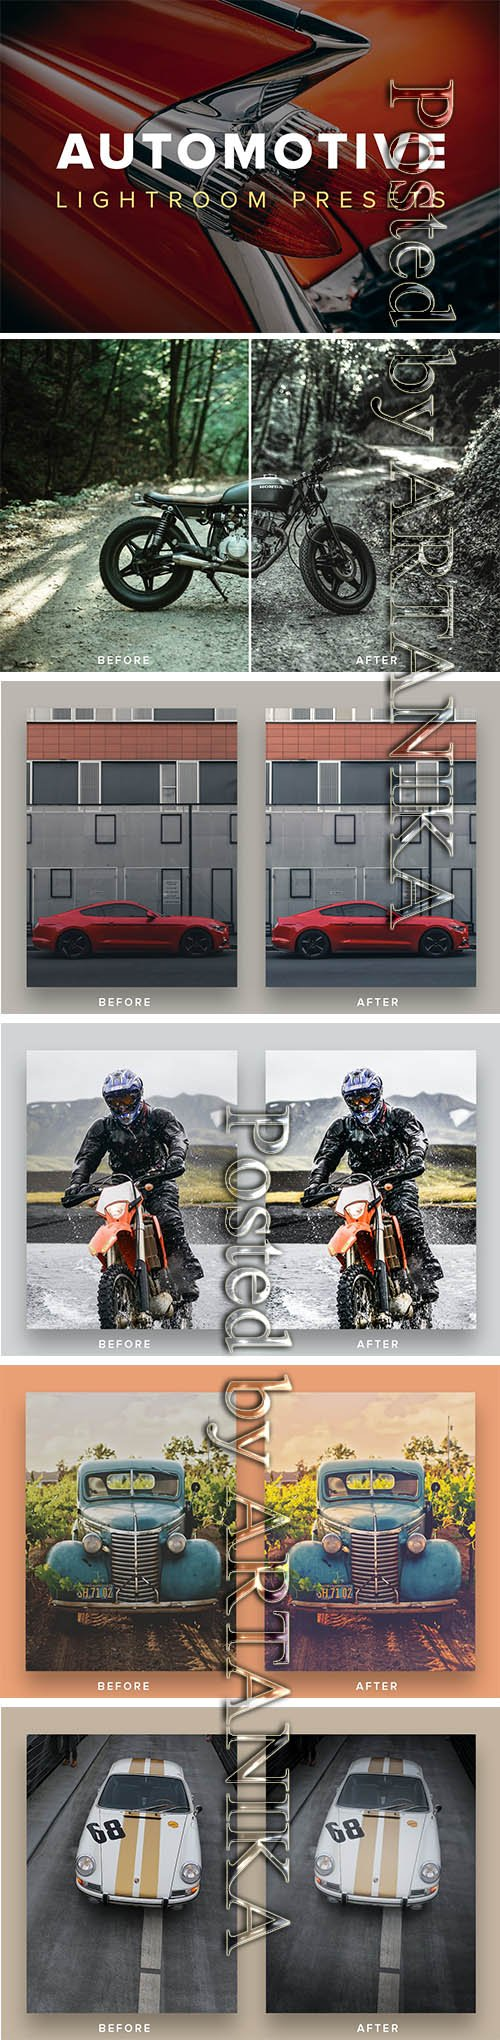 Automotive Lightroom Presets